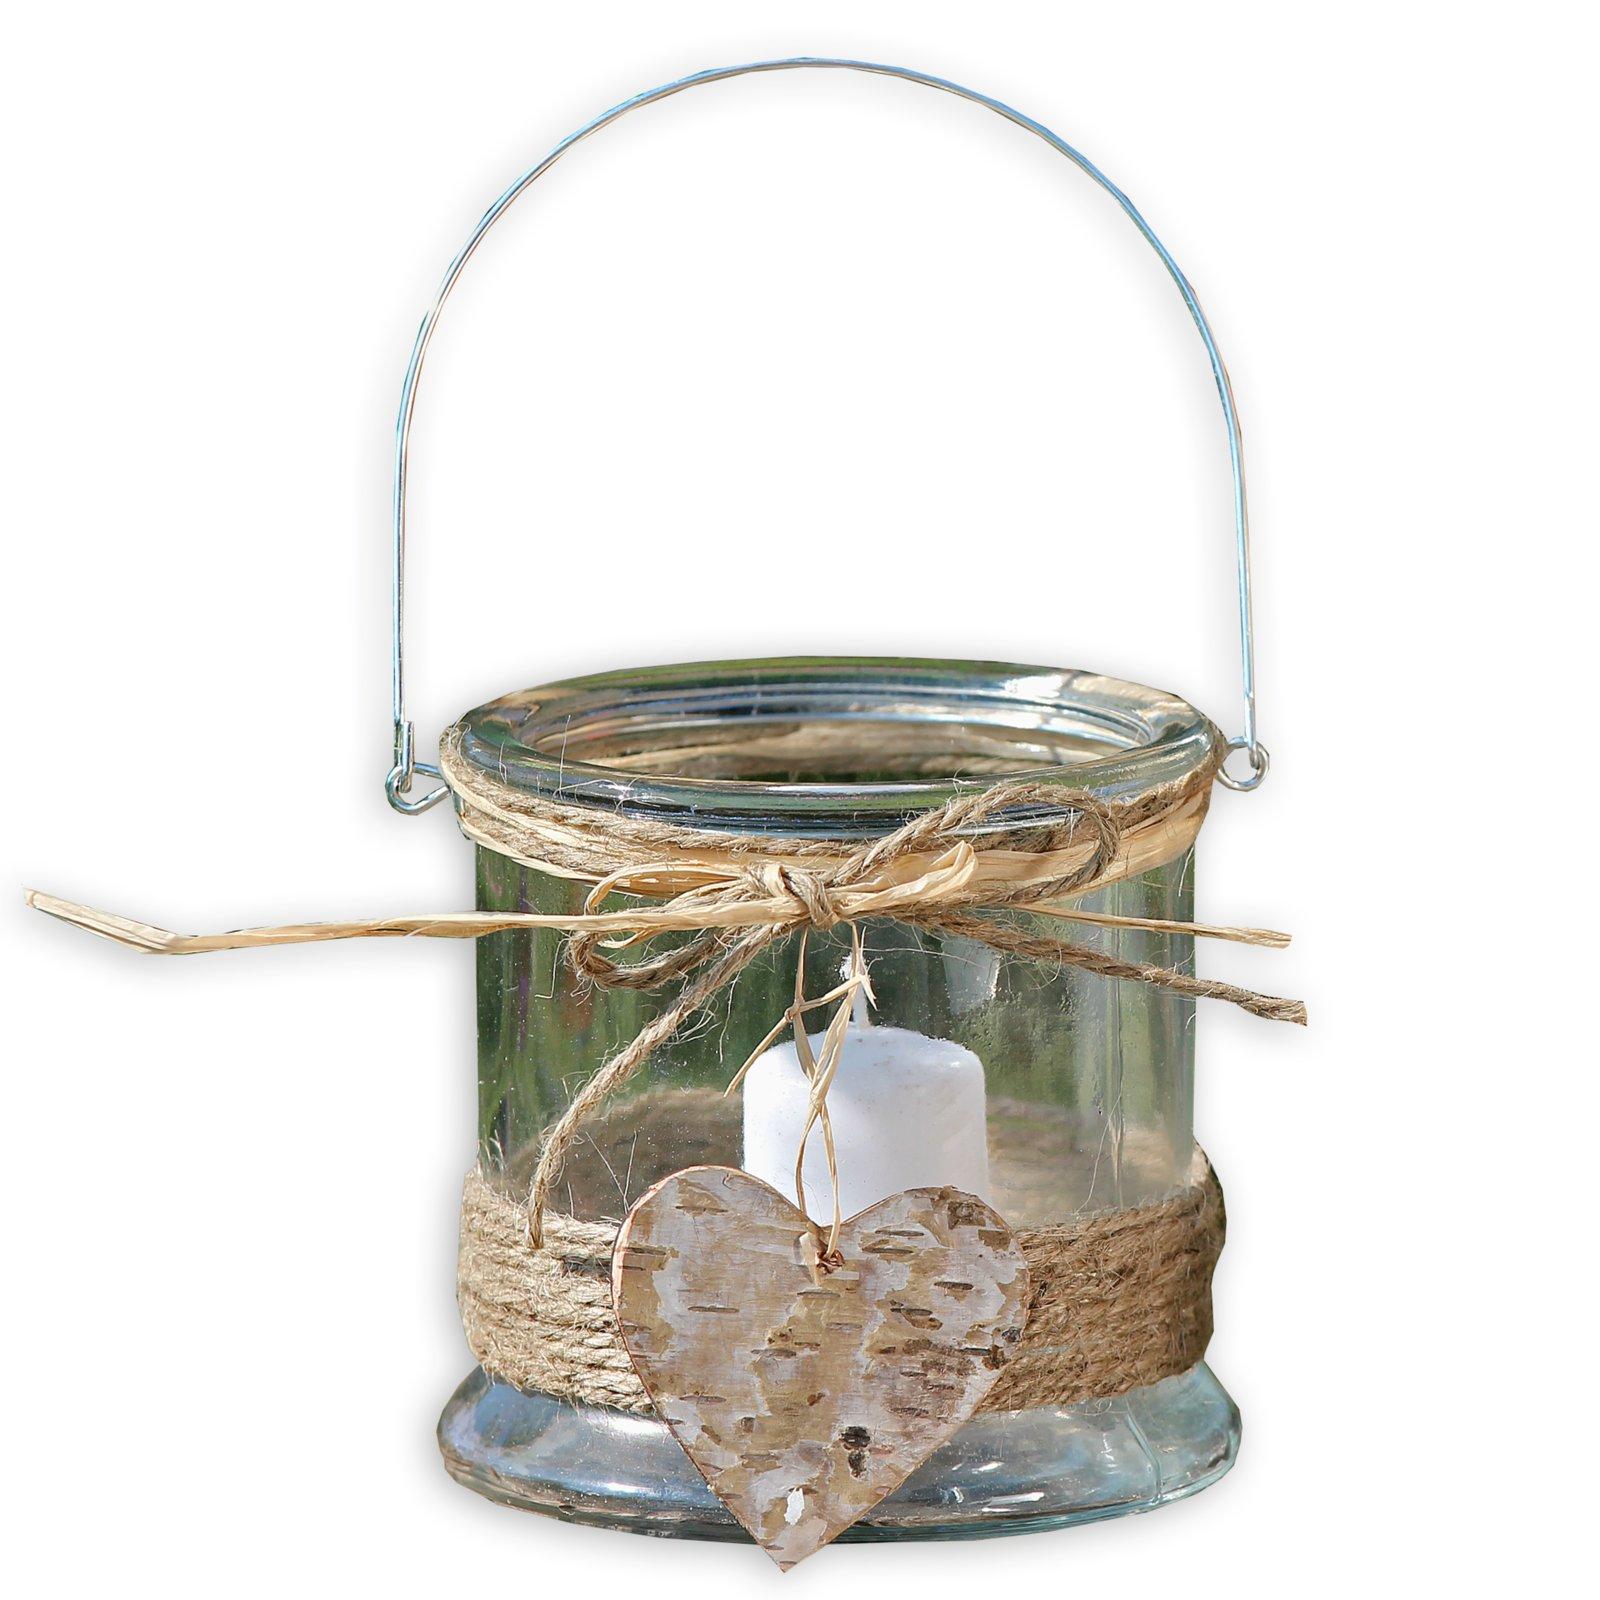 Windlicht klar glas 12 cm kerzen kerzenhalter for Wohnaccessoires deko